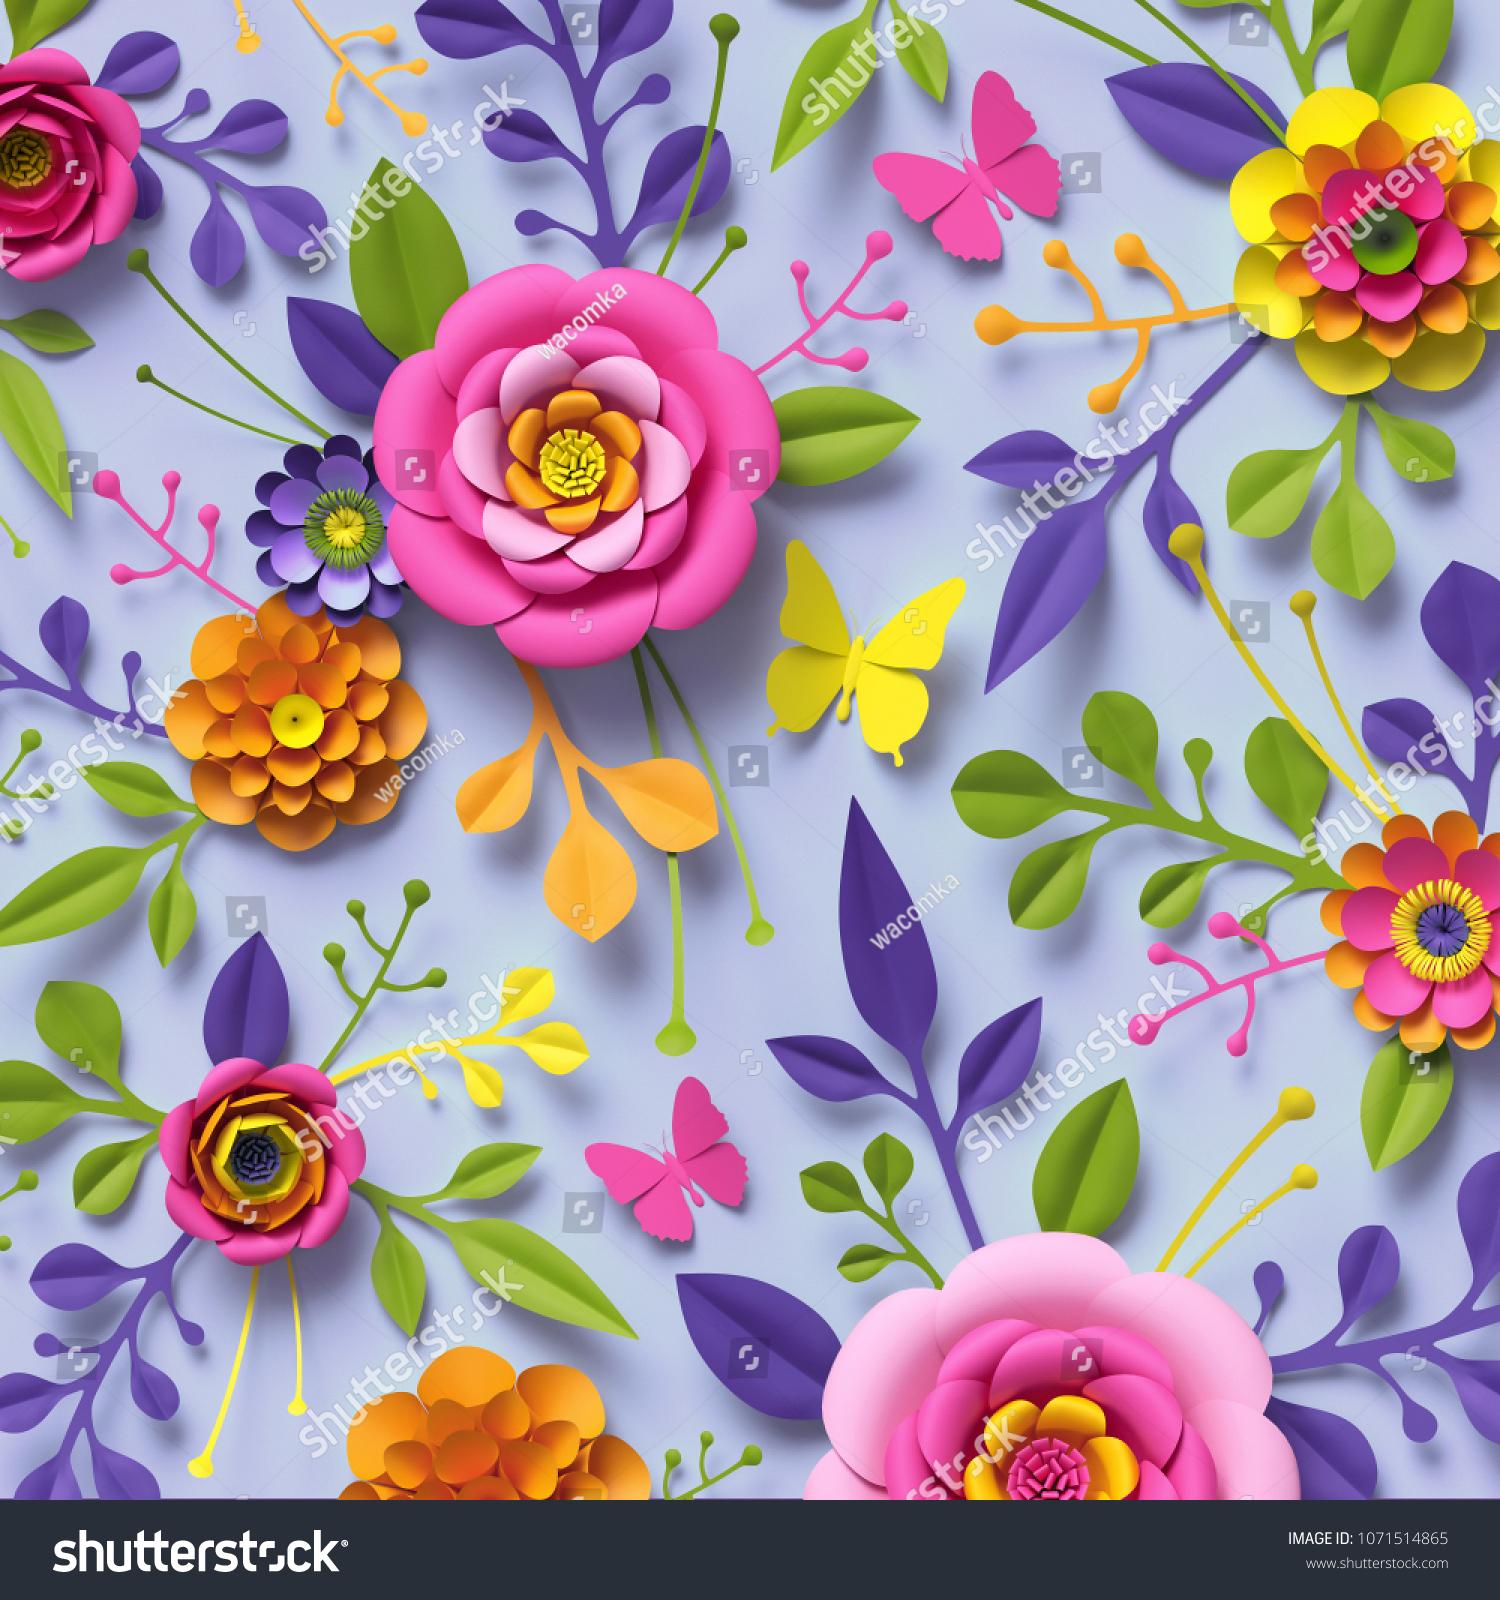 3 d render craft paper flowers festive stock illustration 1071514865 3d render craft paper flowers festive floral bouquet botanical arrangement bright candy izmirmasajfo